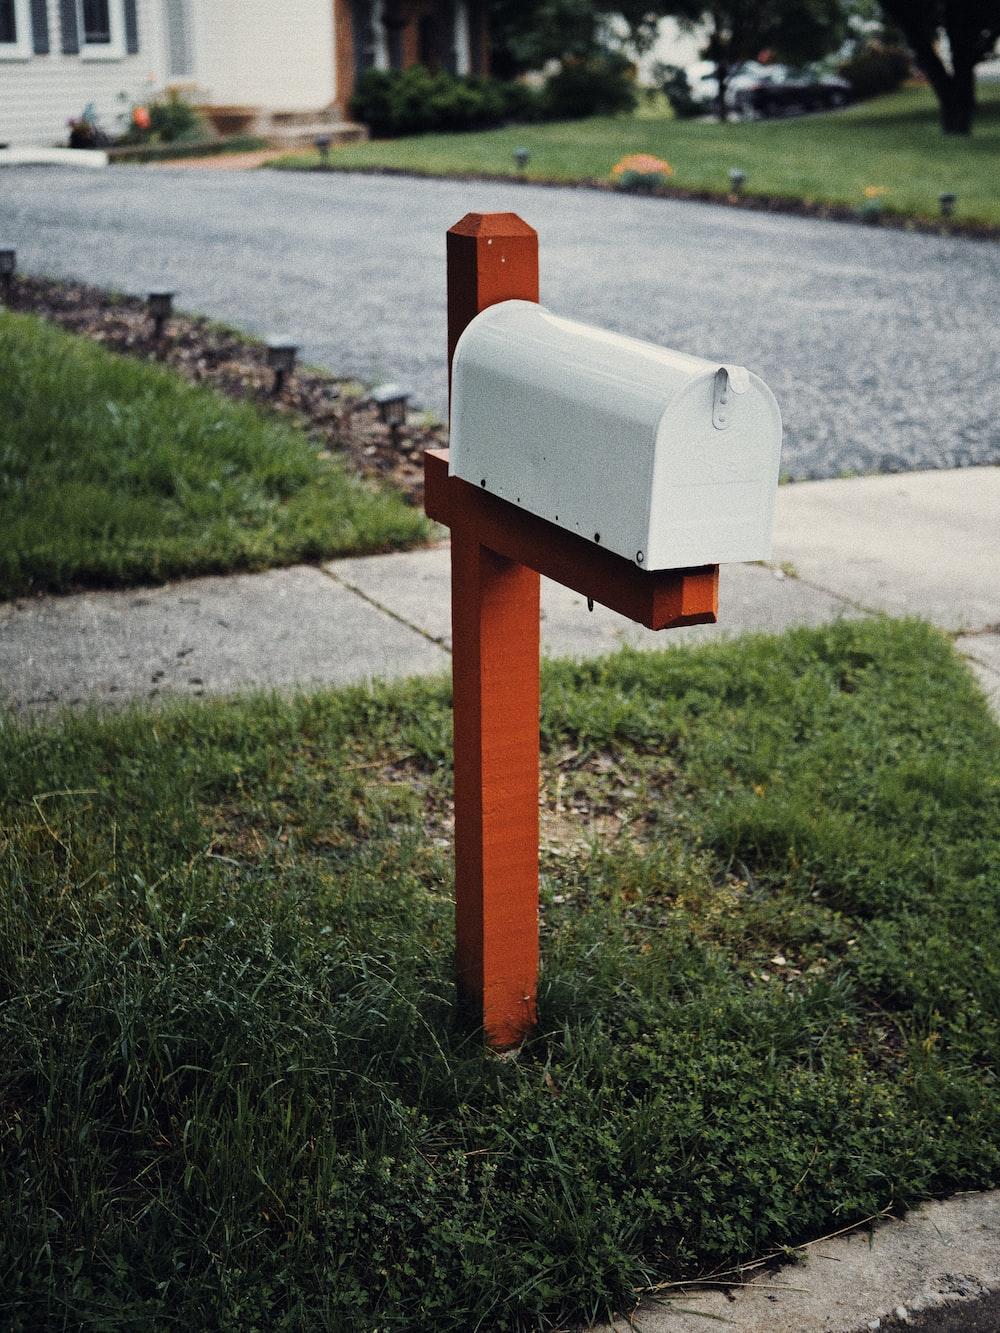 gray metal mail box